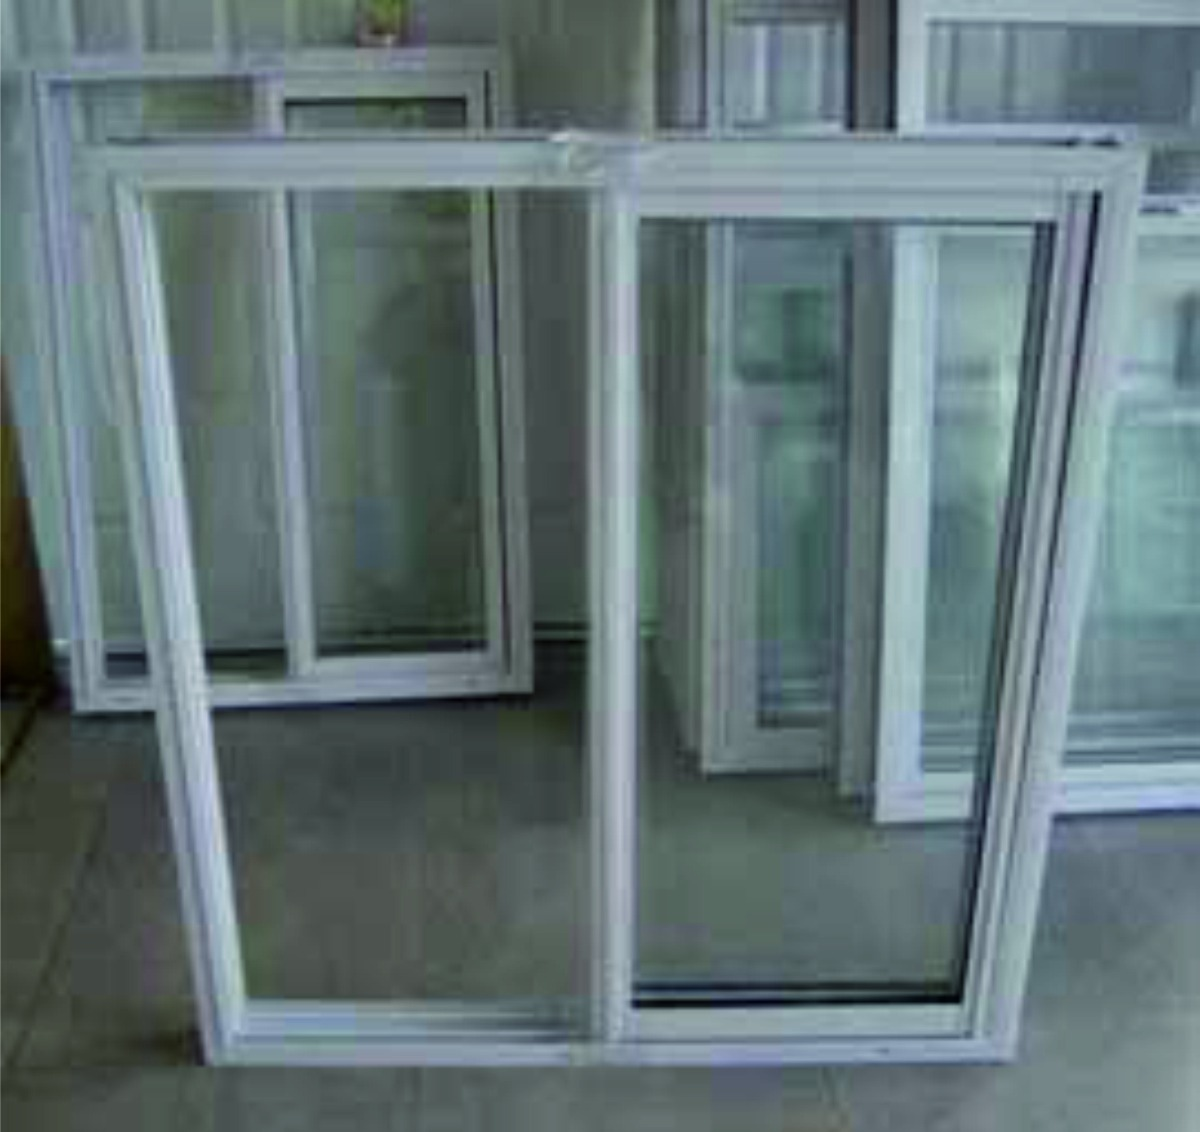 Precio ventanas climalit accesorios ventanas with precio ventanas climalit gallery of precios - Cristal climalit precio ...